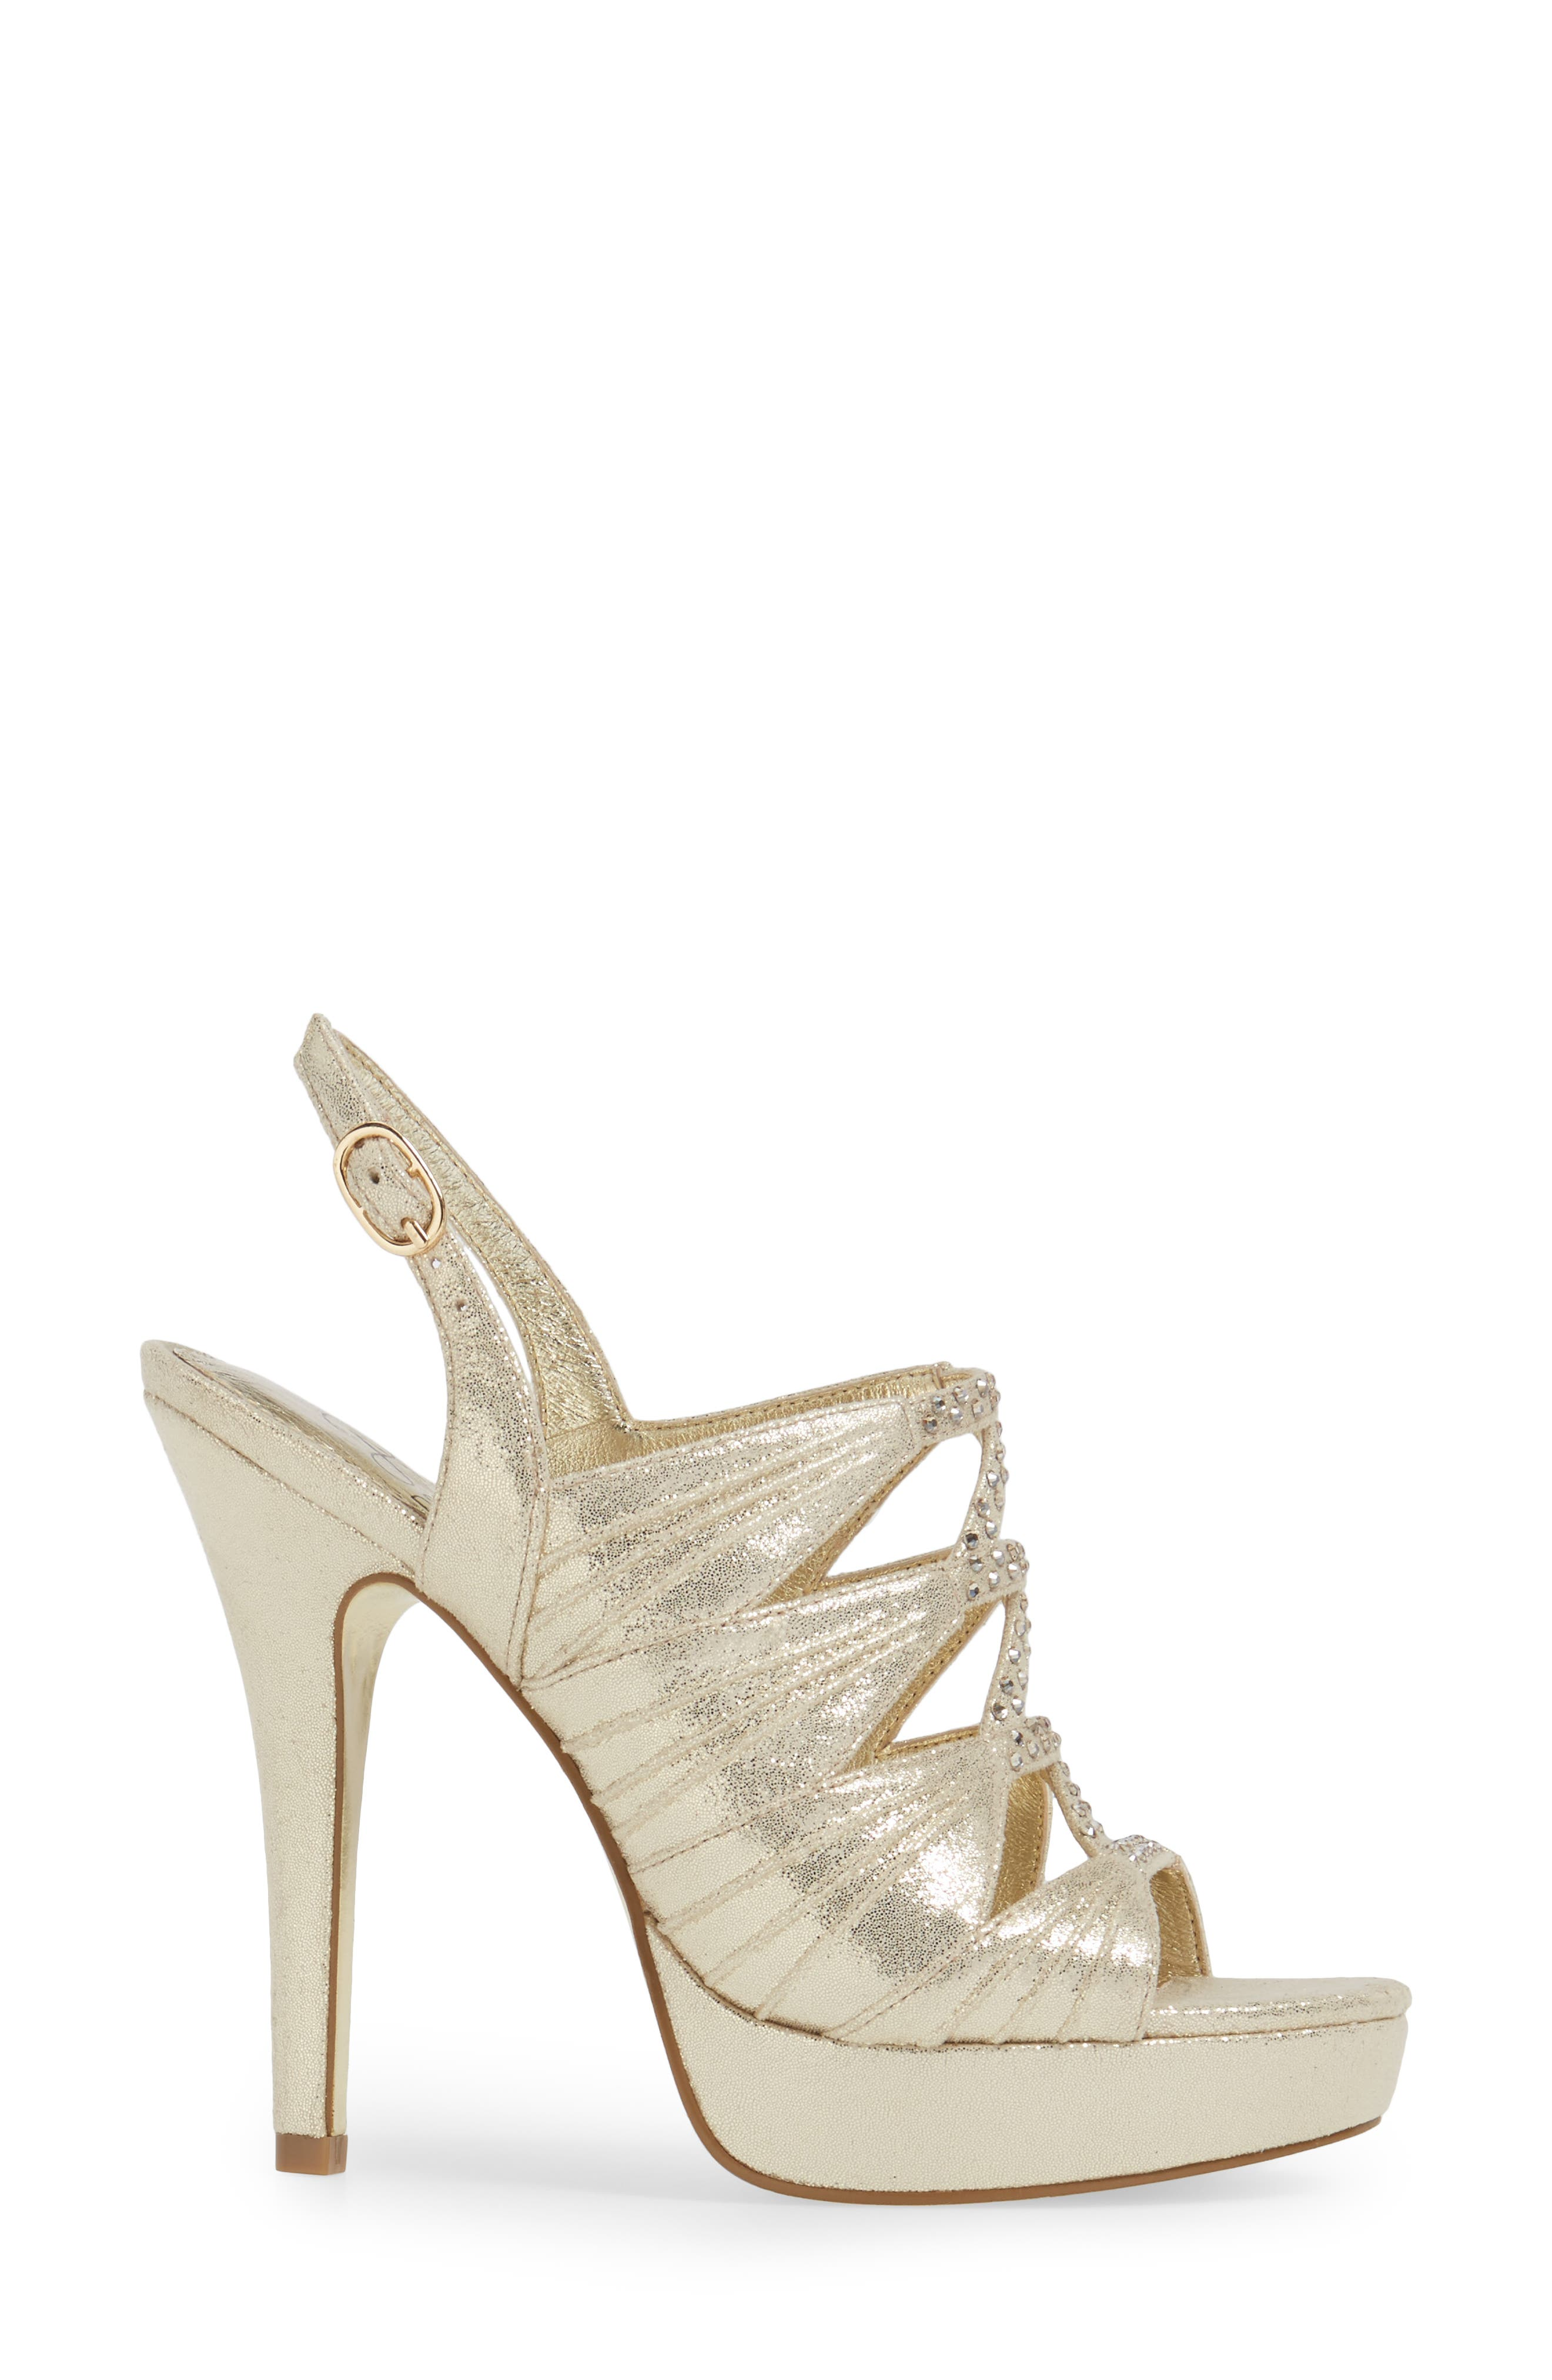 Alternate Image 3  - Adrianna Pappell Marissa Platform Sandal (Women)